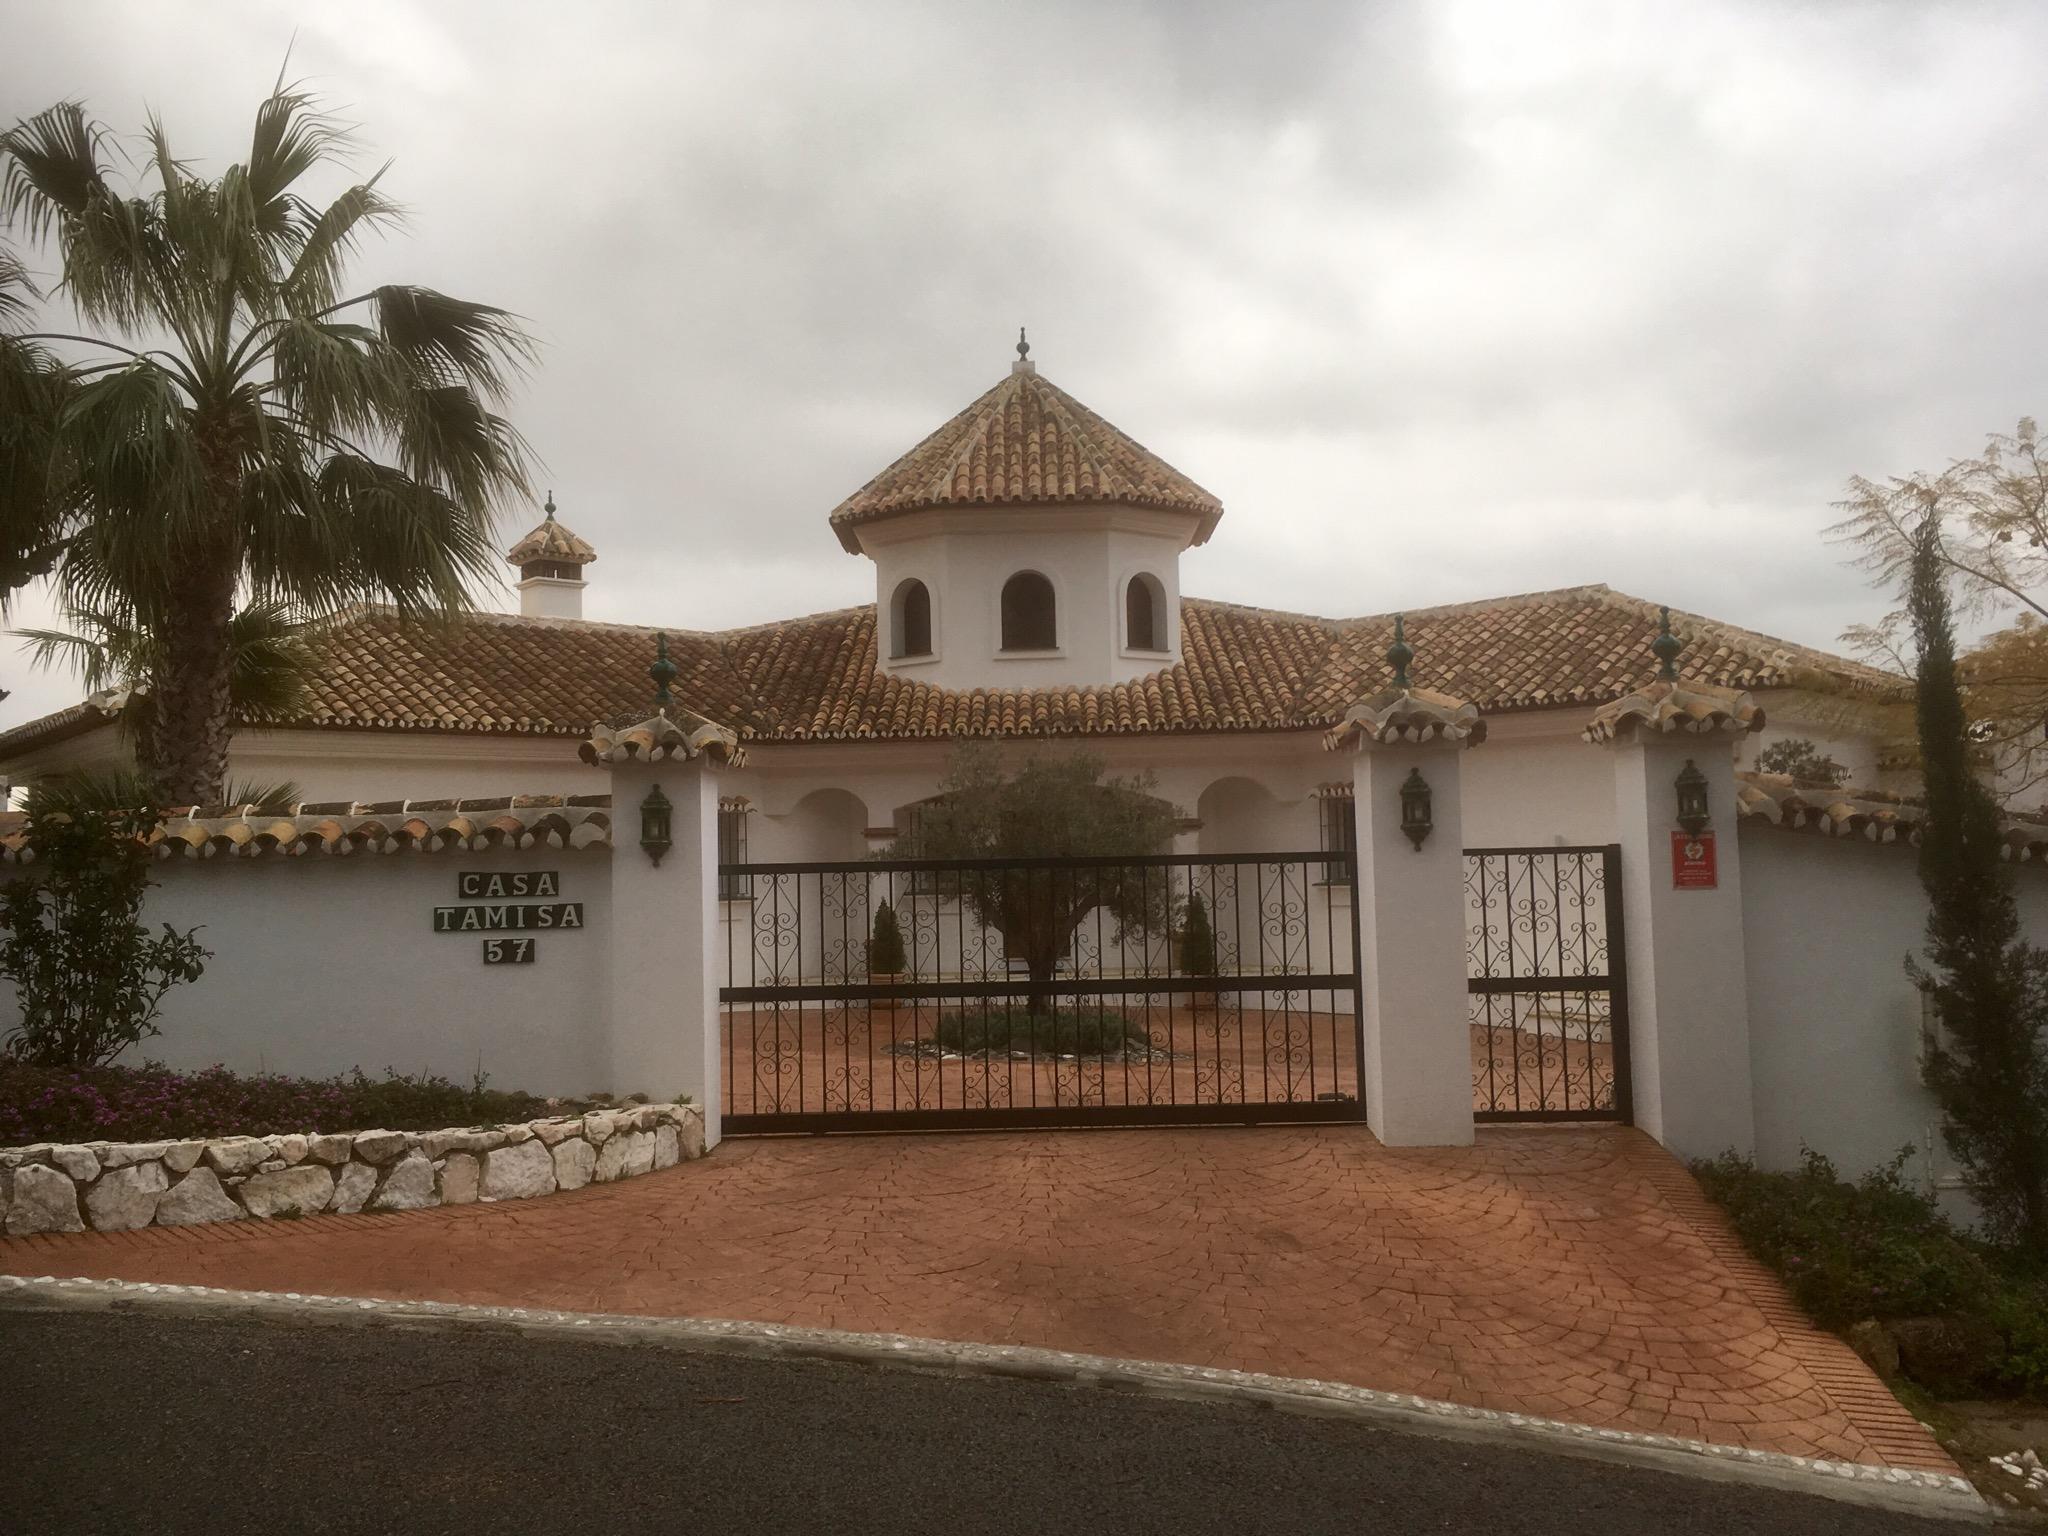 Gran Senda de Malaga: GR249  23/24thFeb  Entrerrios to Mijas